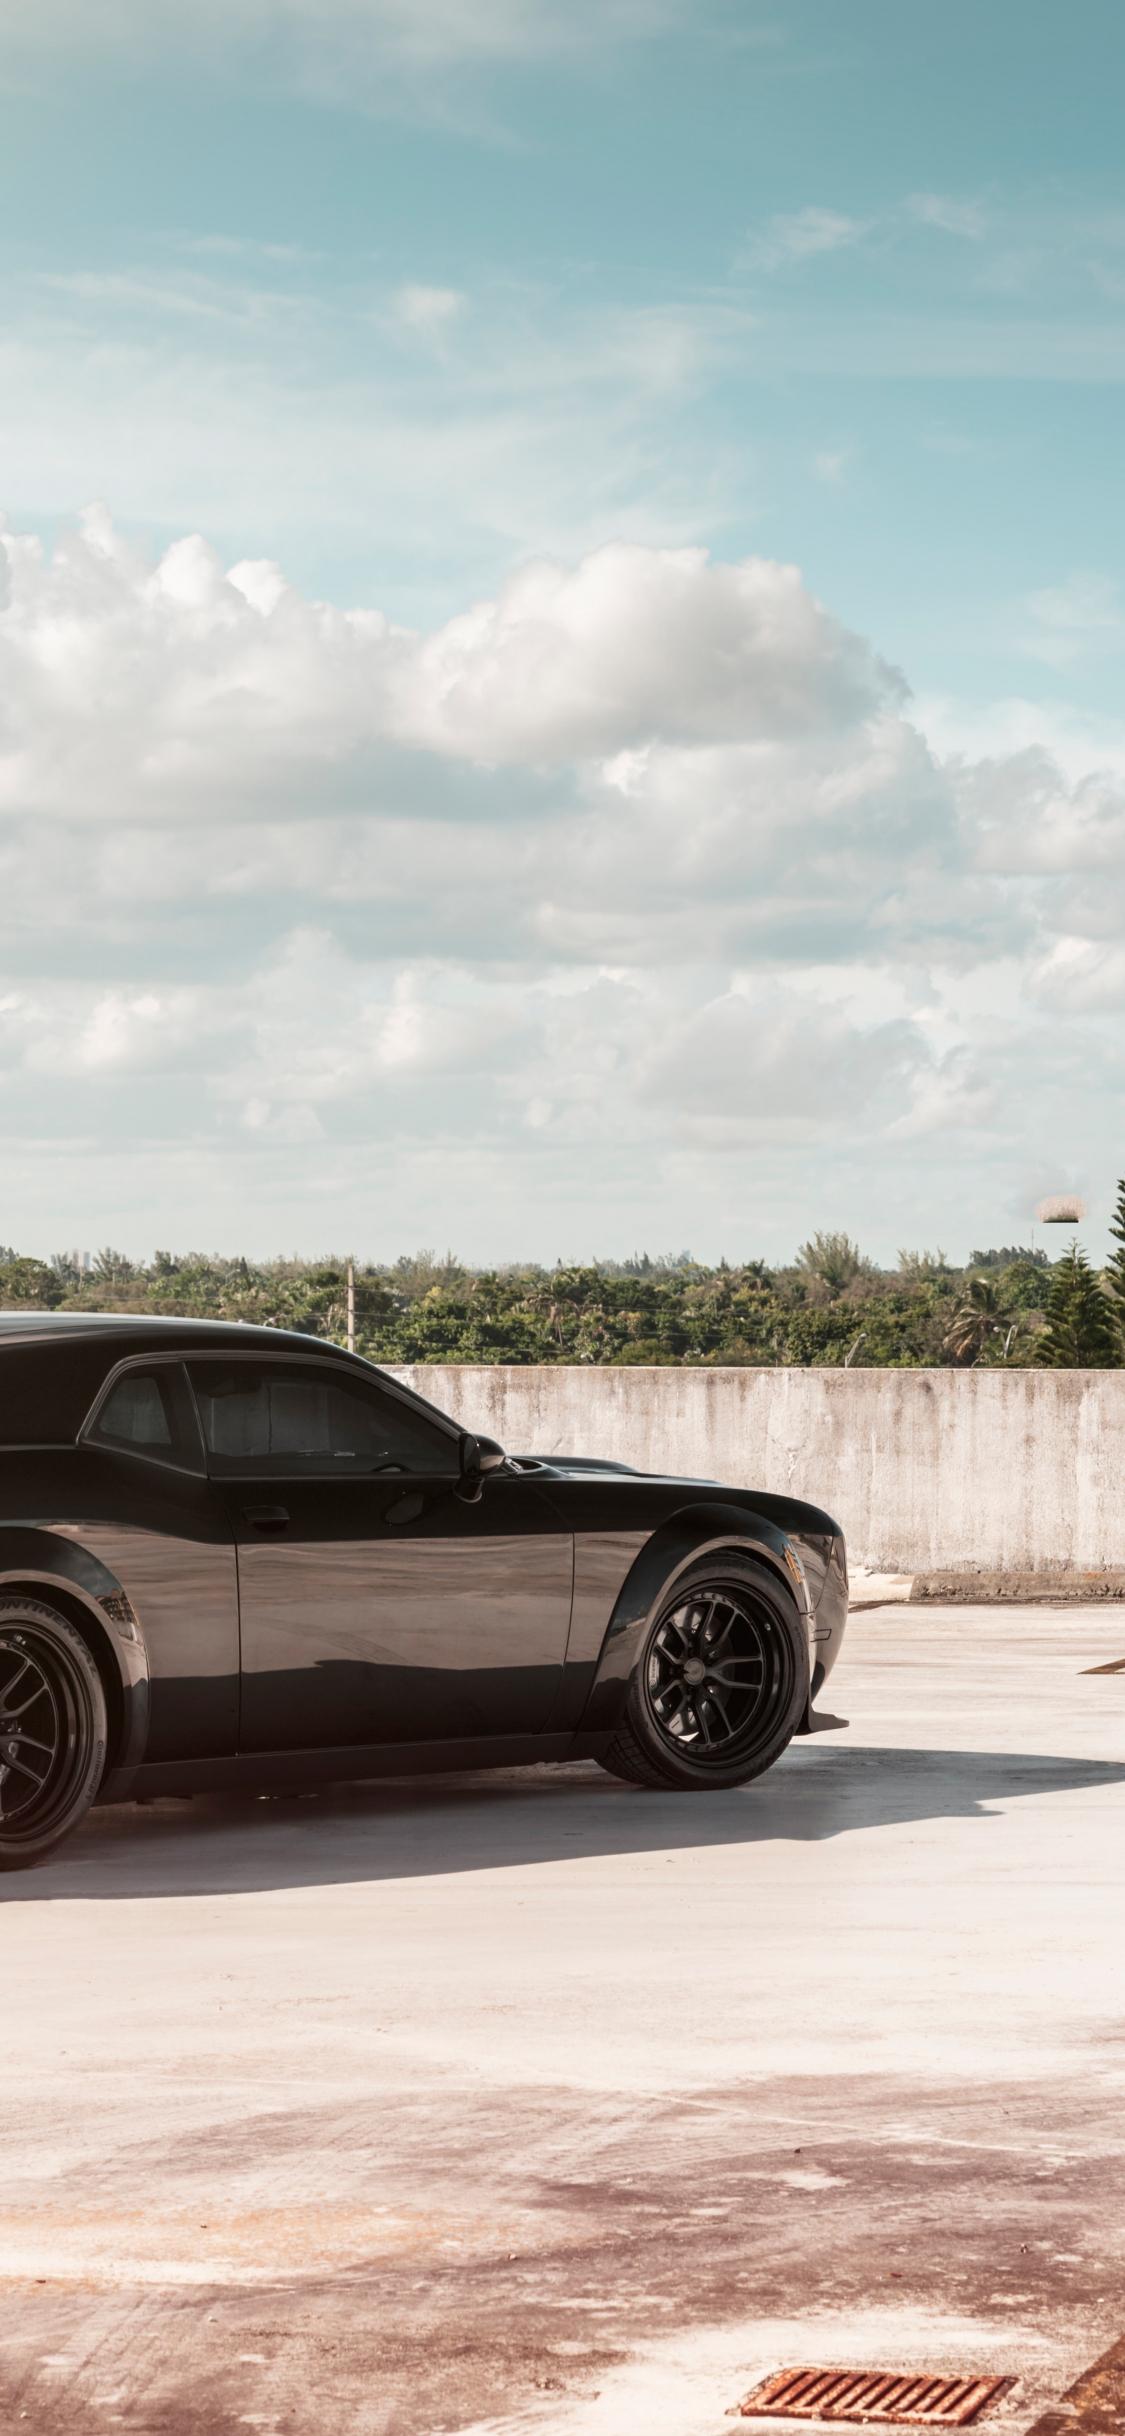 Download 1125x2436 Wallpaper Black Dodge Challenger Srt Muscle Car 2019 Iphone X 1125x2436 Hd Image Background 21486